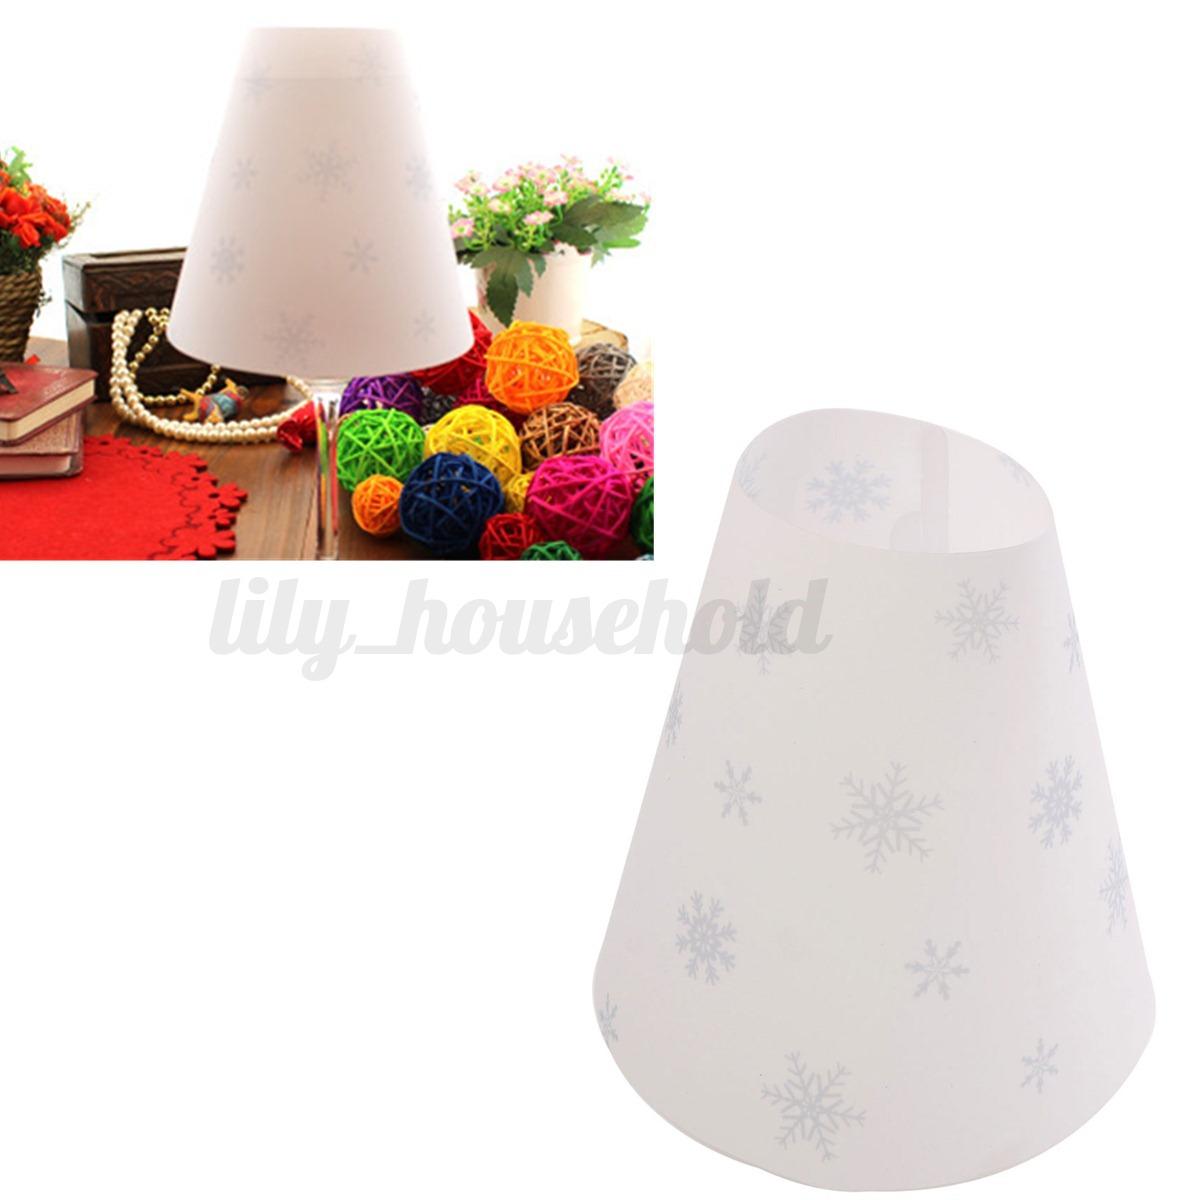 Deko lampenschirm ersatzglas tischlampe schirmf r glas for Teelicht deko